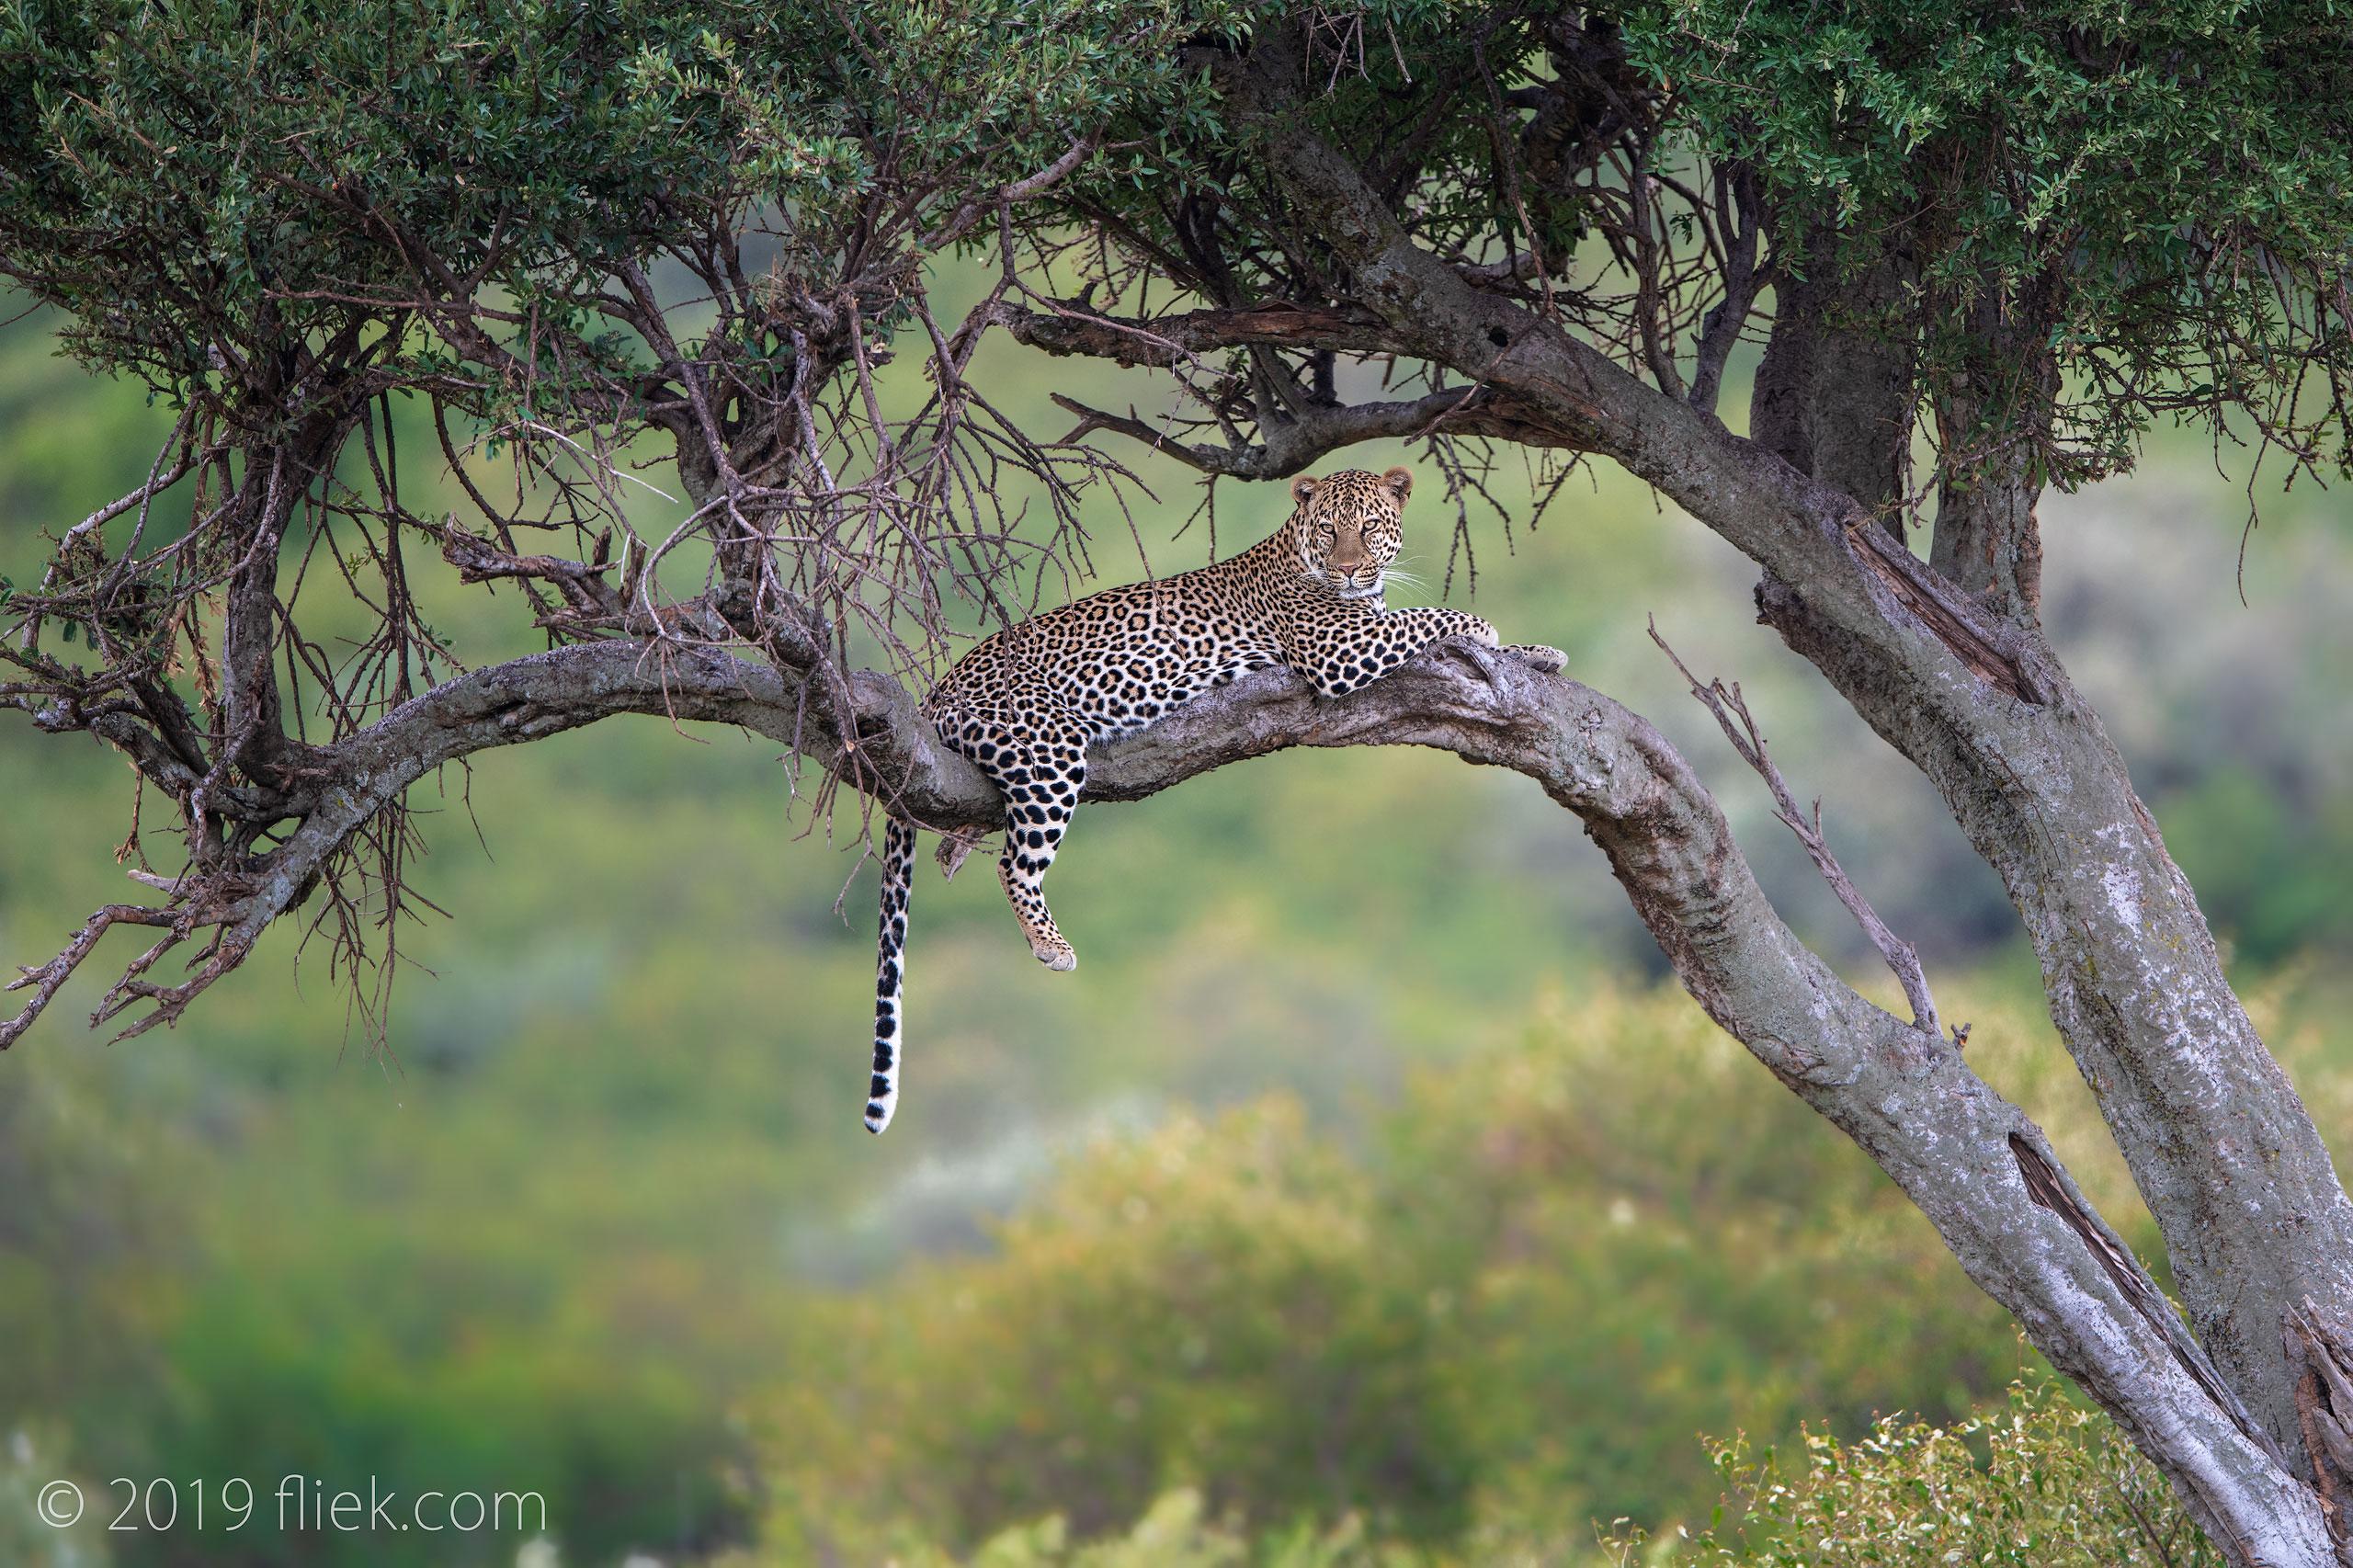 Masai Mara: the Journey Begins